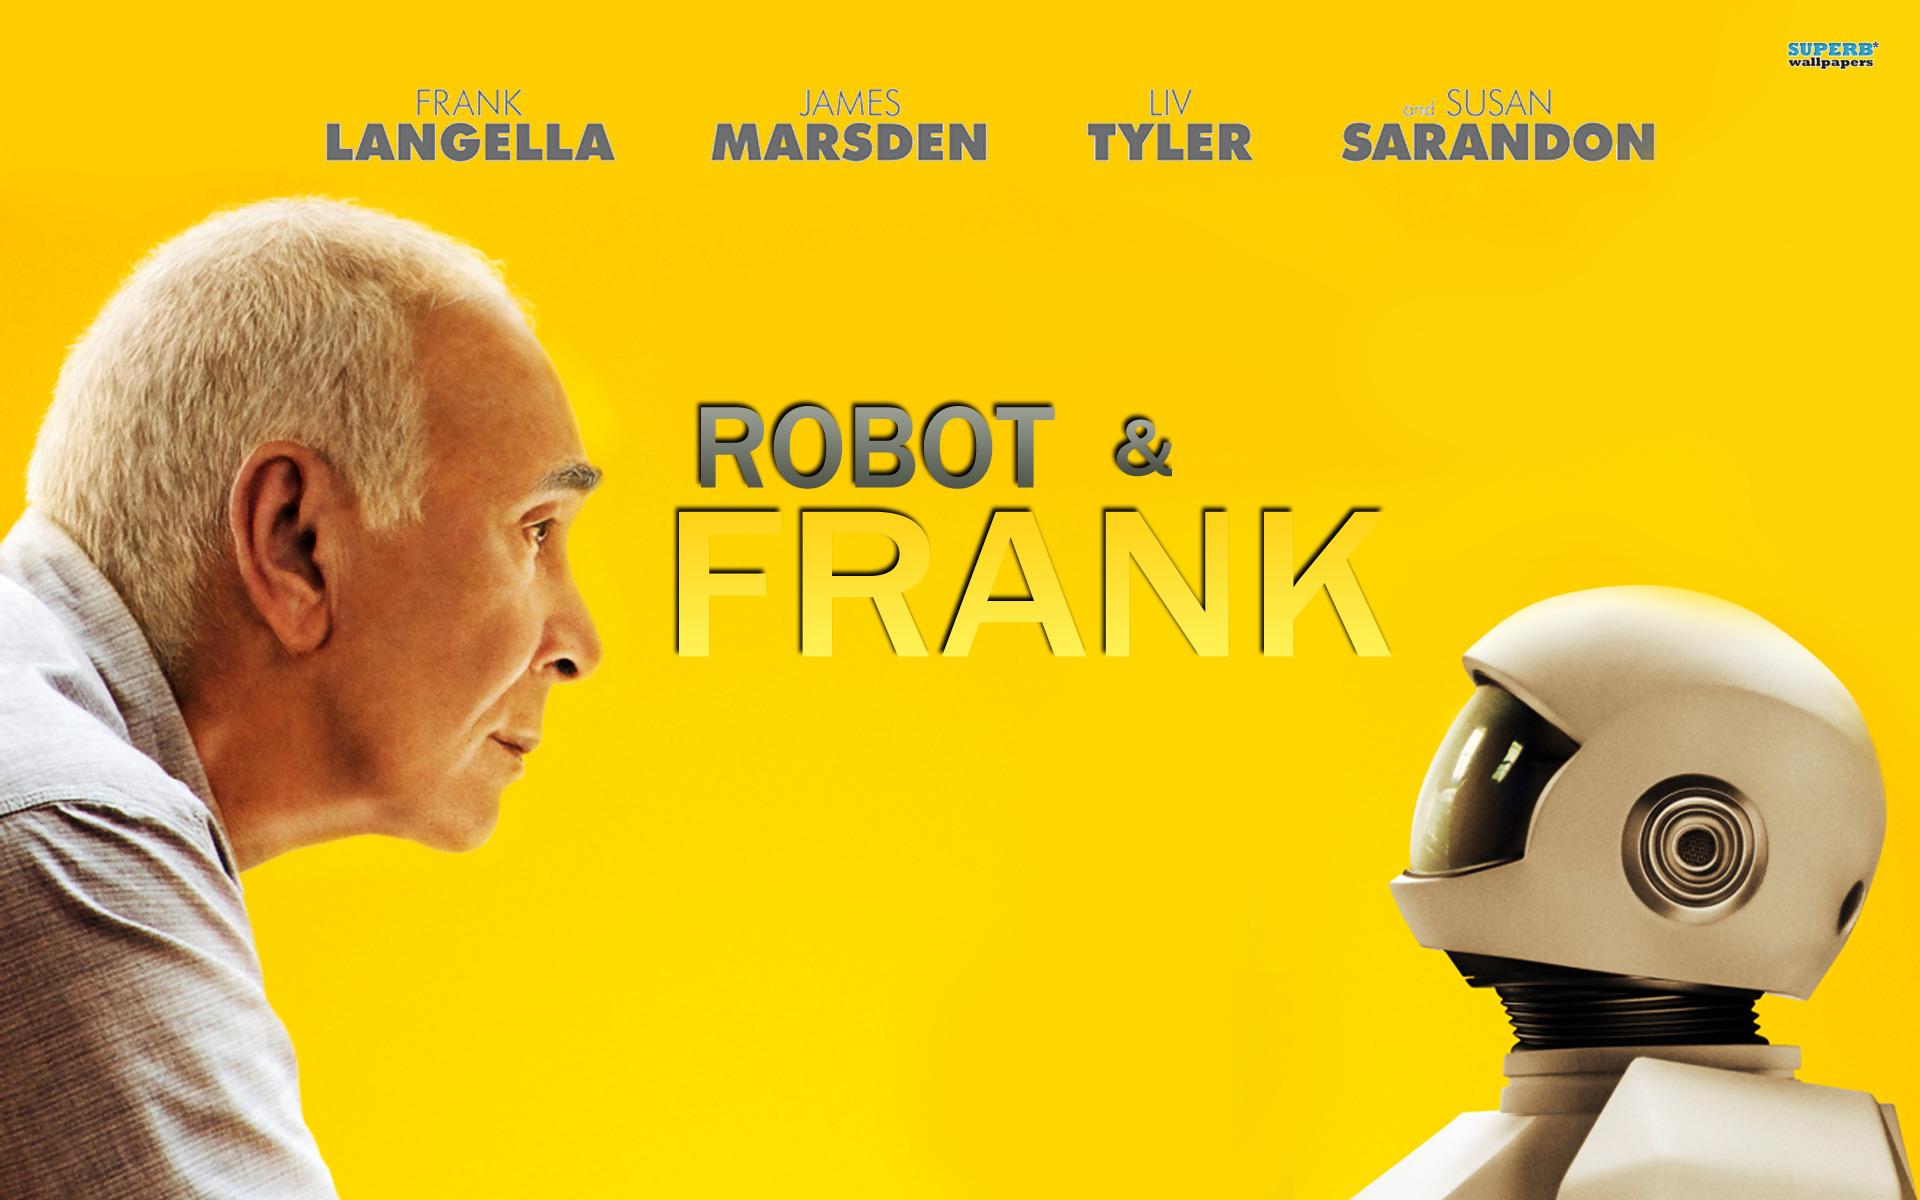 Bon anniversaire leukirix Frank-robot-and-frank-13724-1920x1200